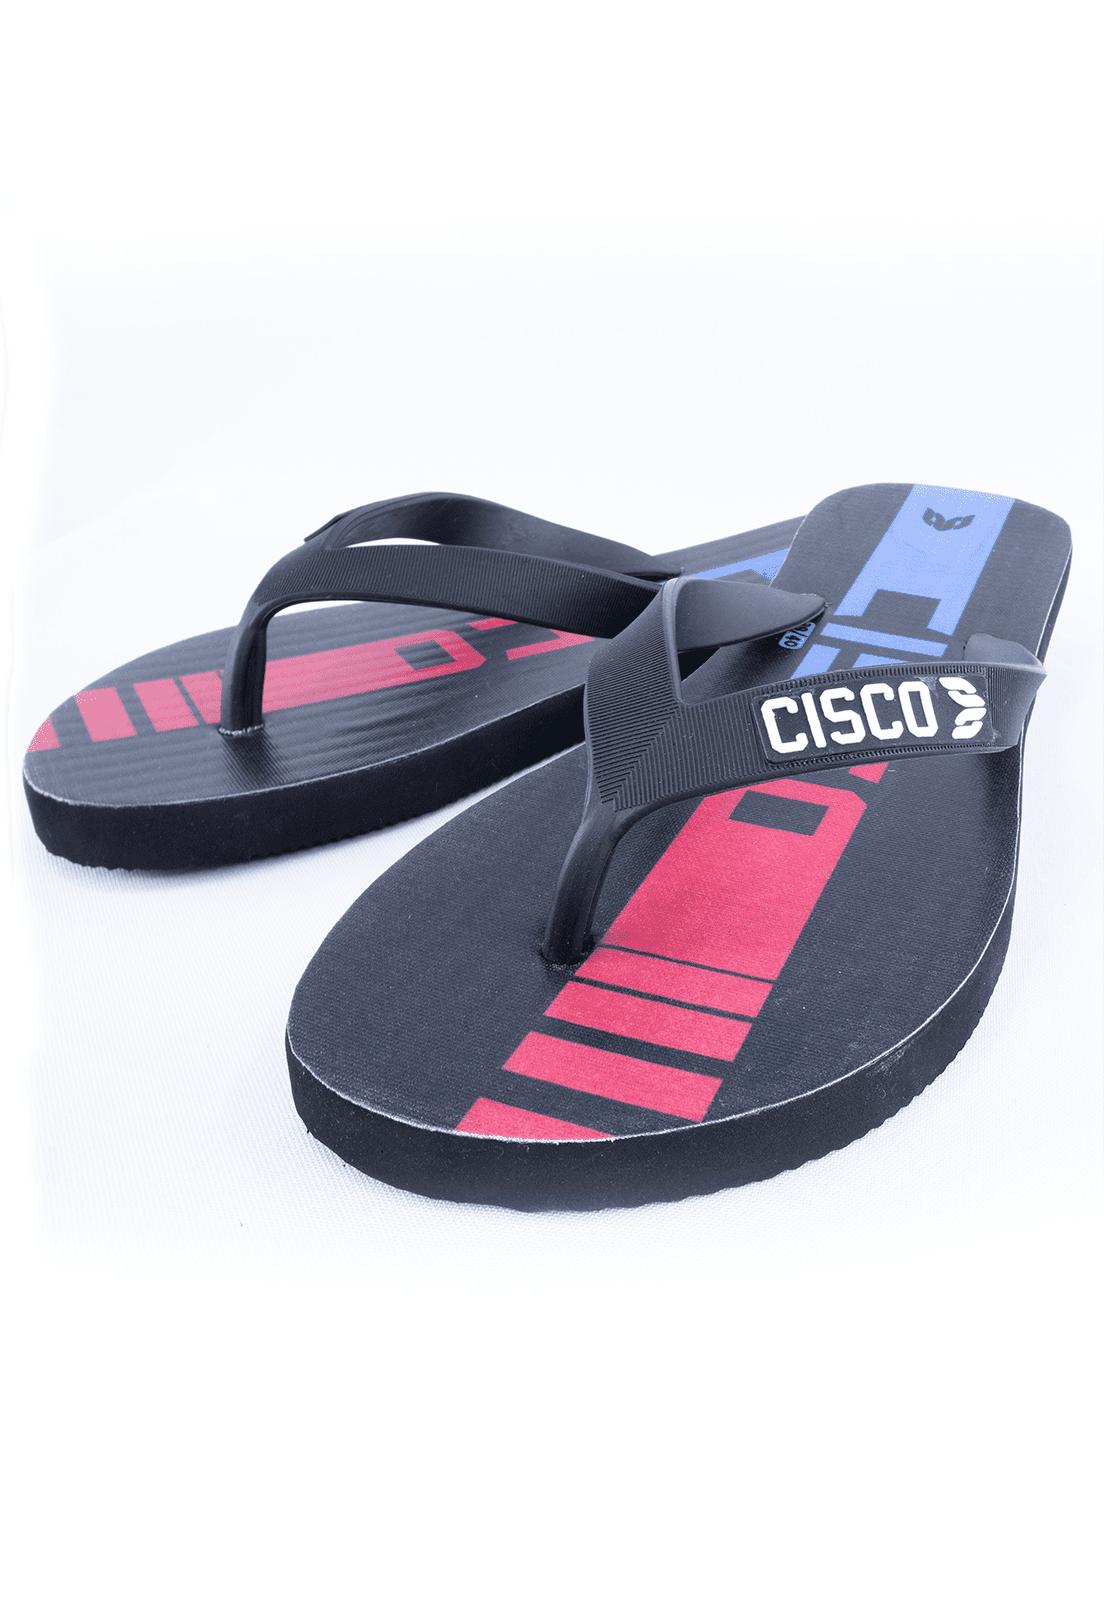 Chinelo Cisco Skate Company